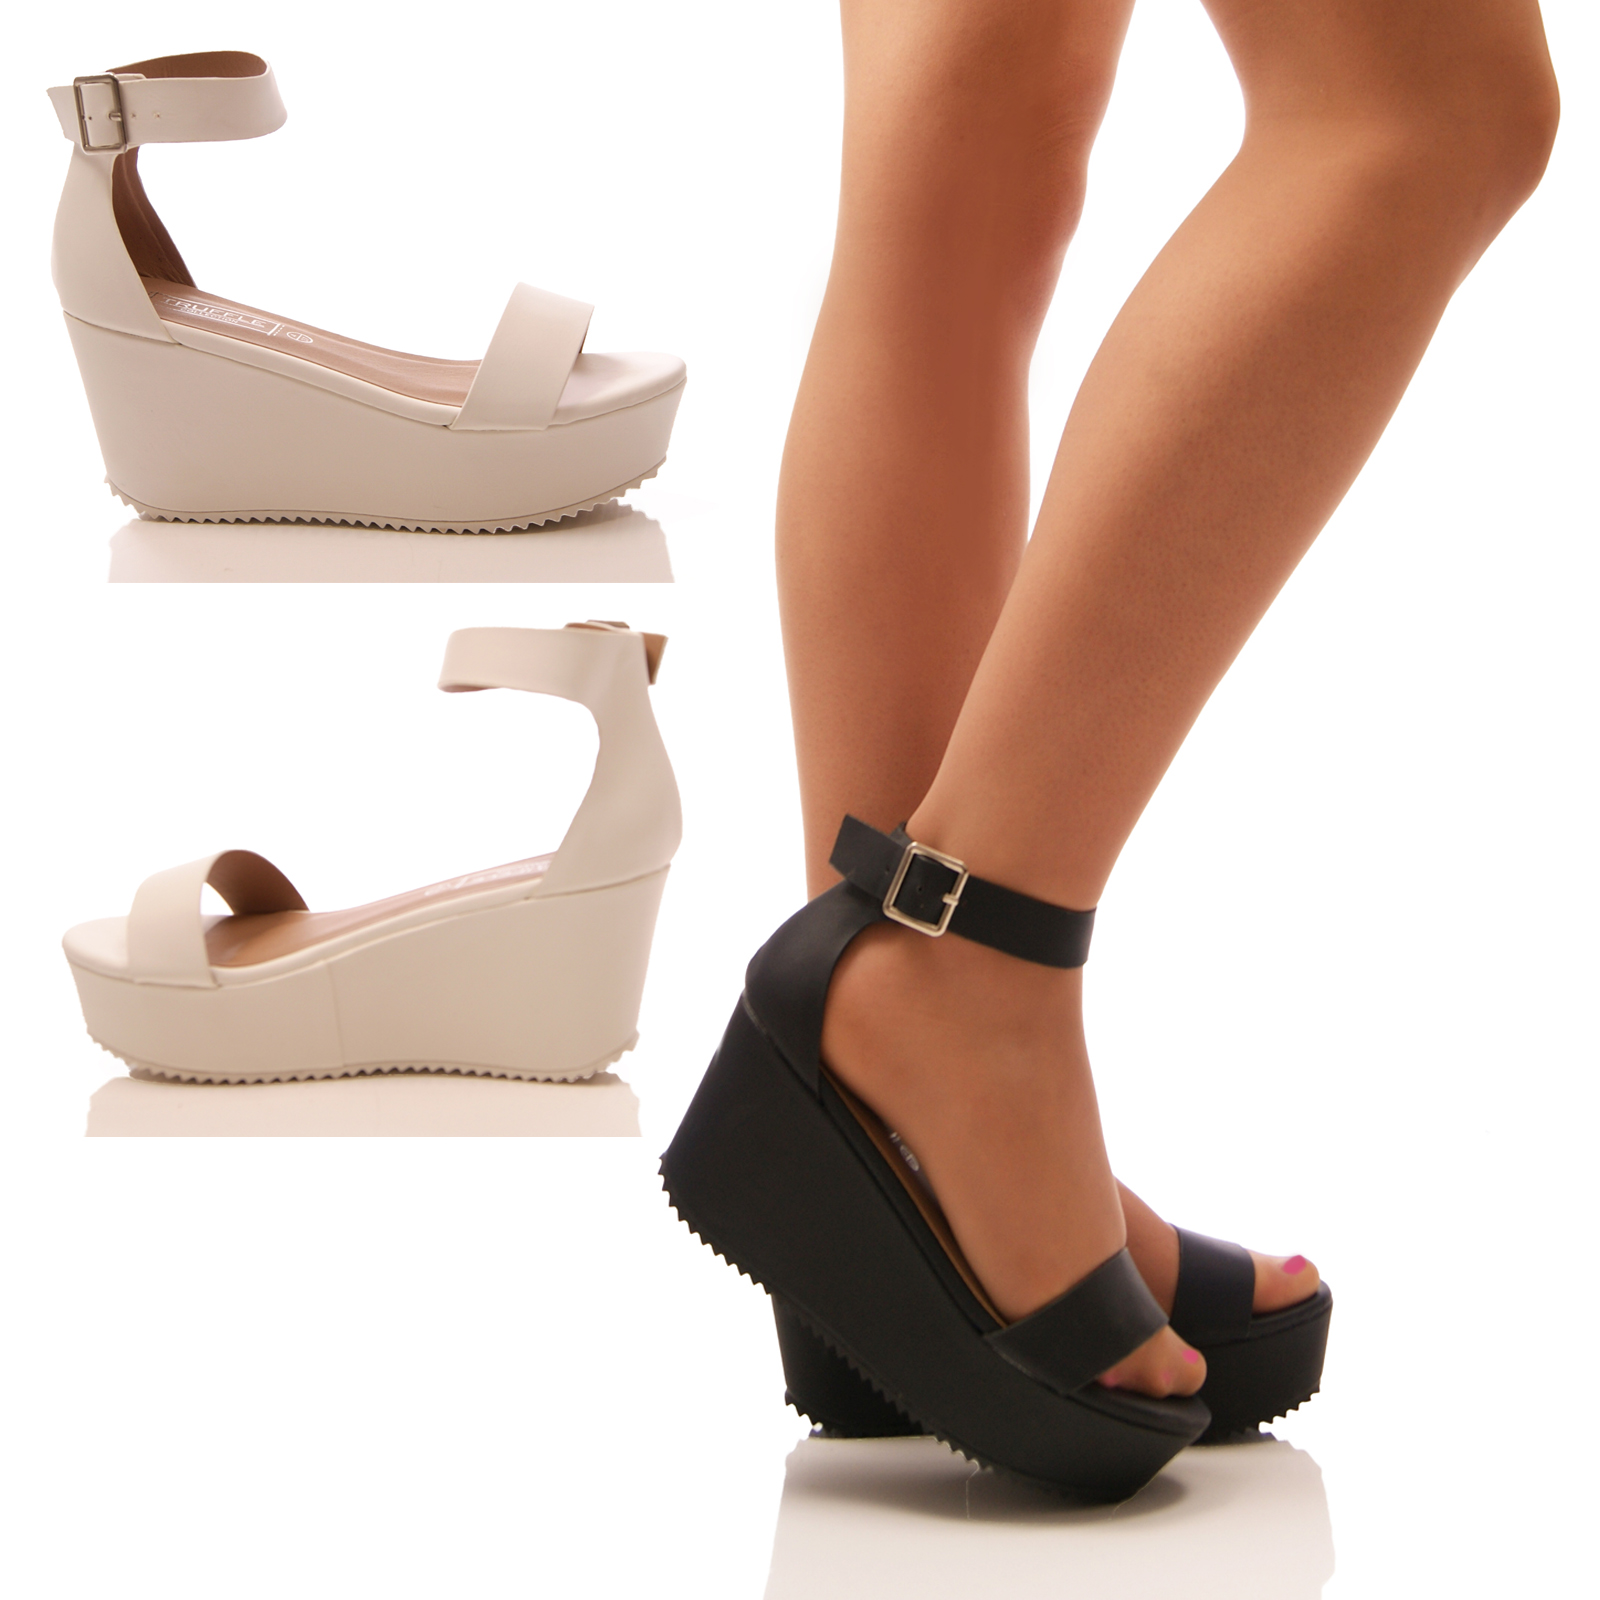 Mujer Zapatos Zapatos Zapatos Mujer Plataforma Mujer Plataforma Plataforma Plana Plana 3q4AR5jL